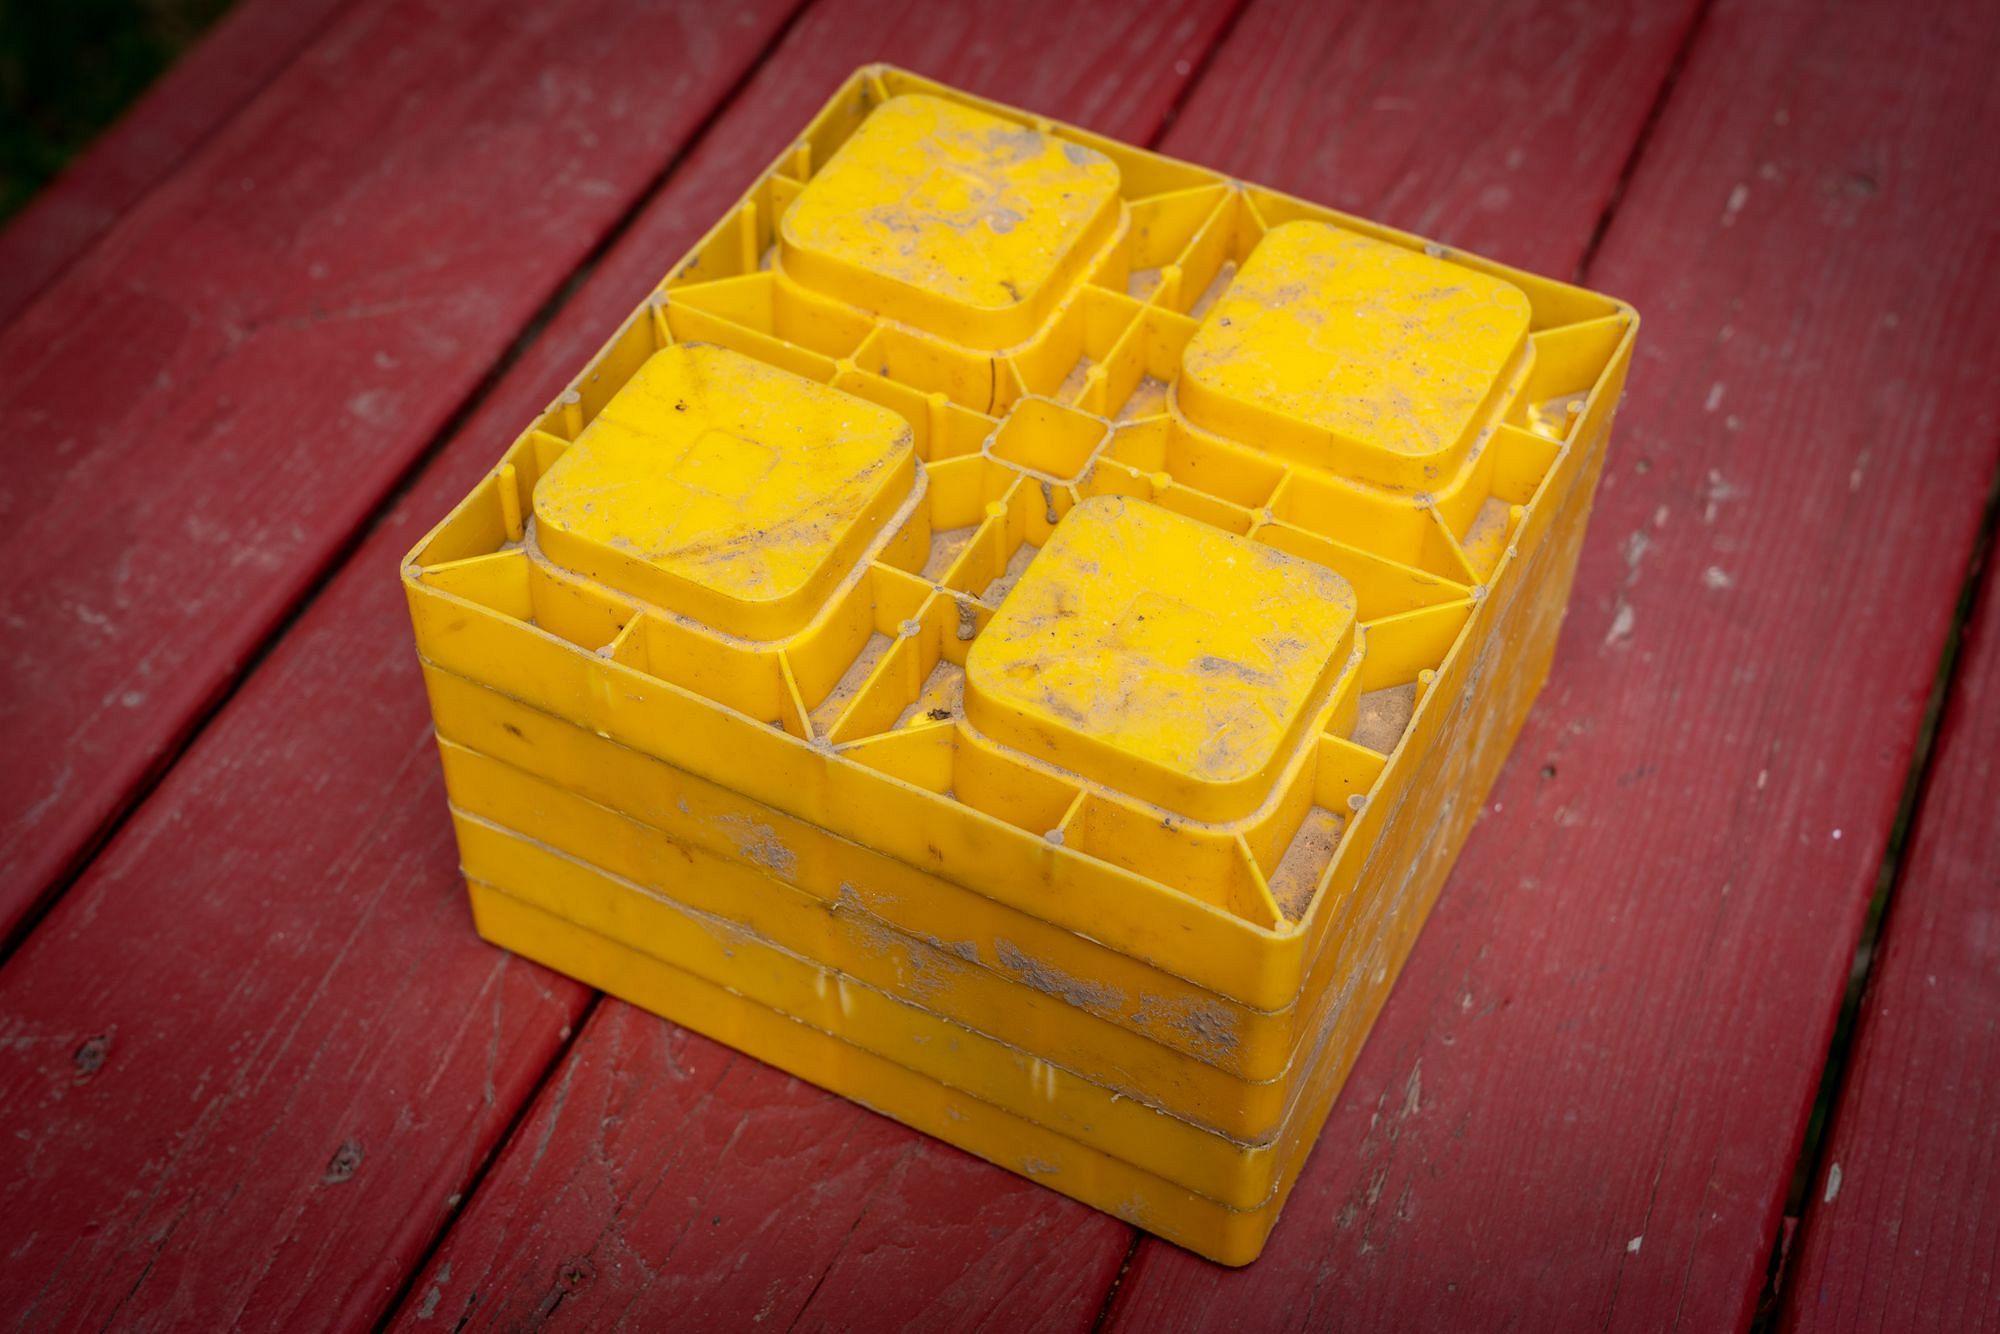 Camco Yellow Blocks